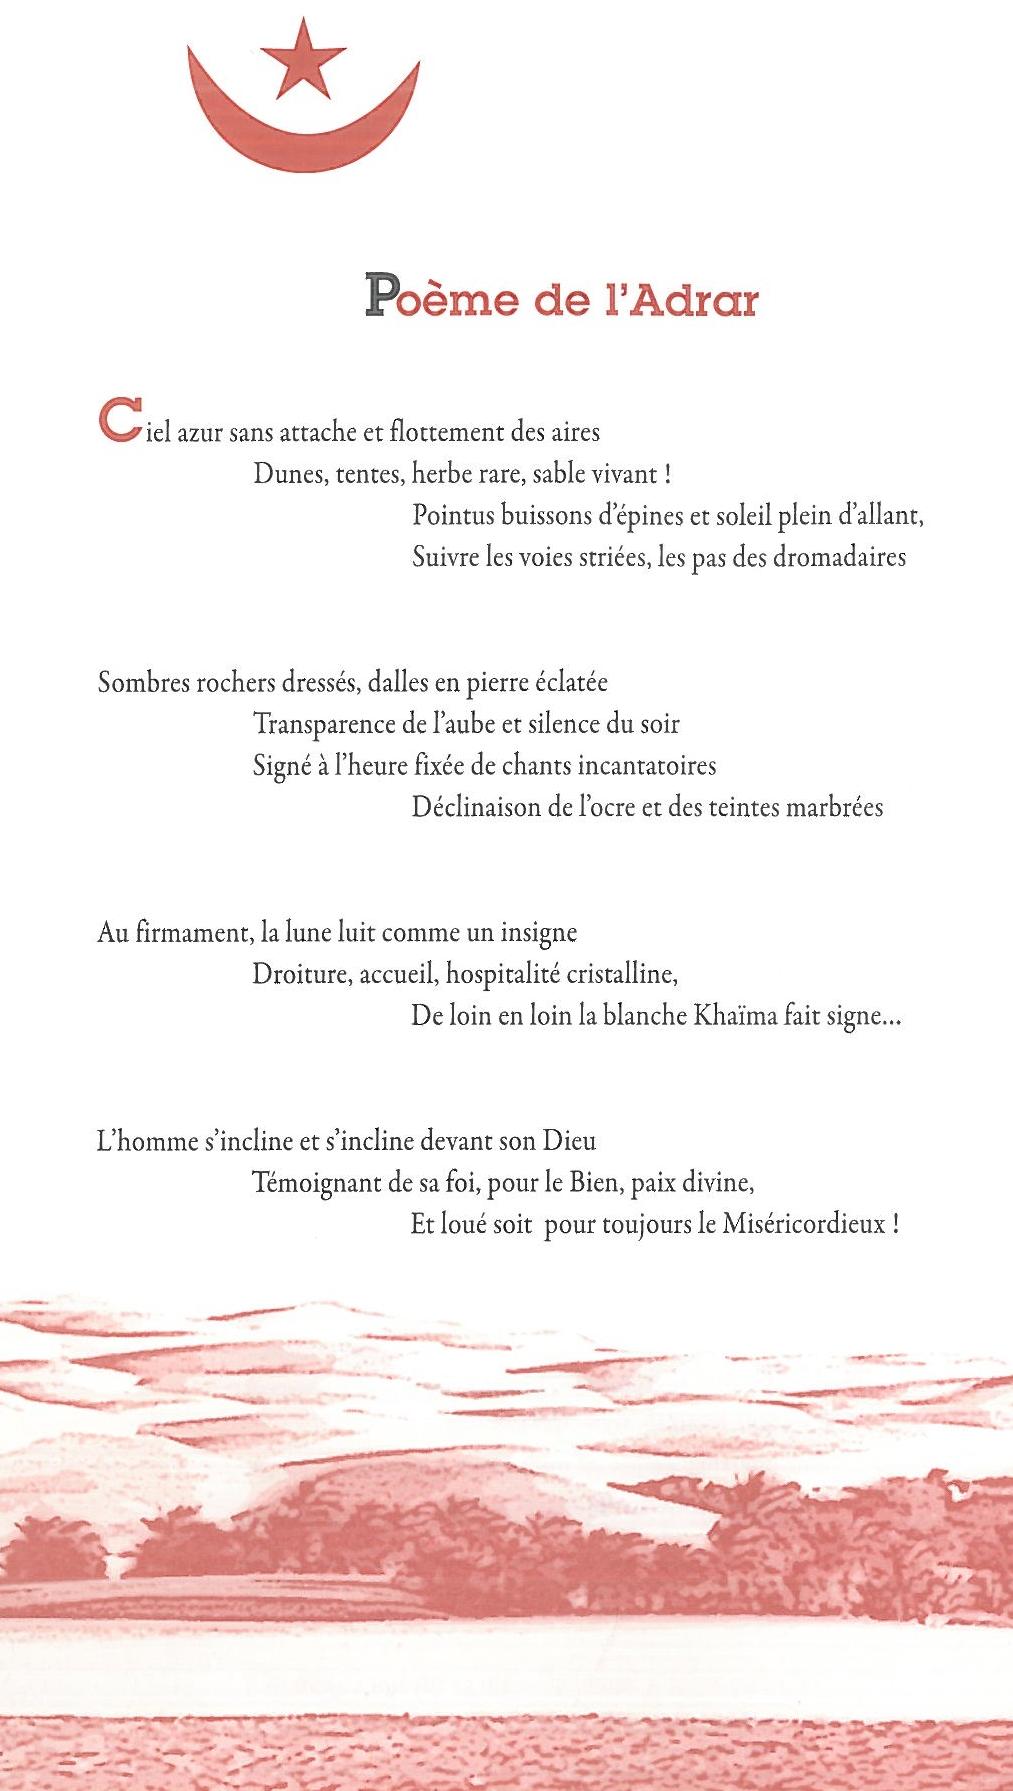 Poème de l'Adrar